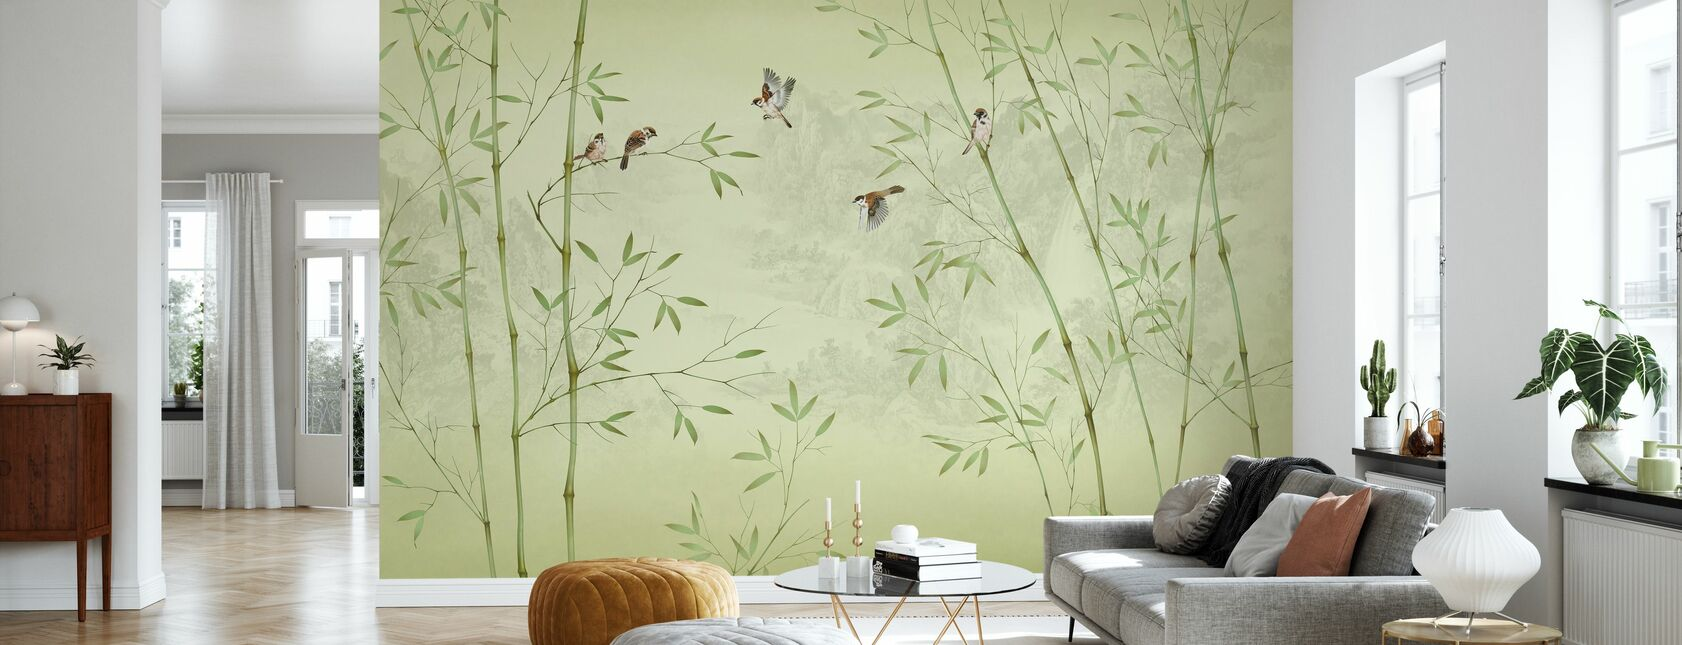 Bamboo Birds - Yellowish - Wallpaper - Living Room